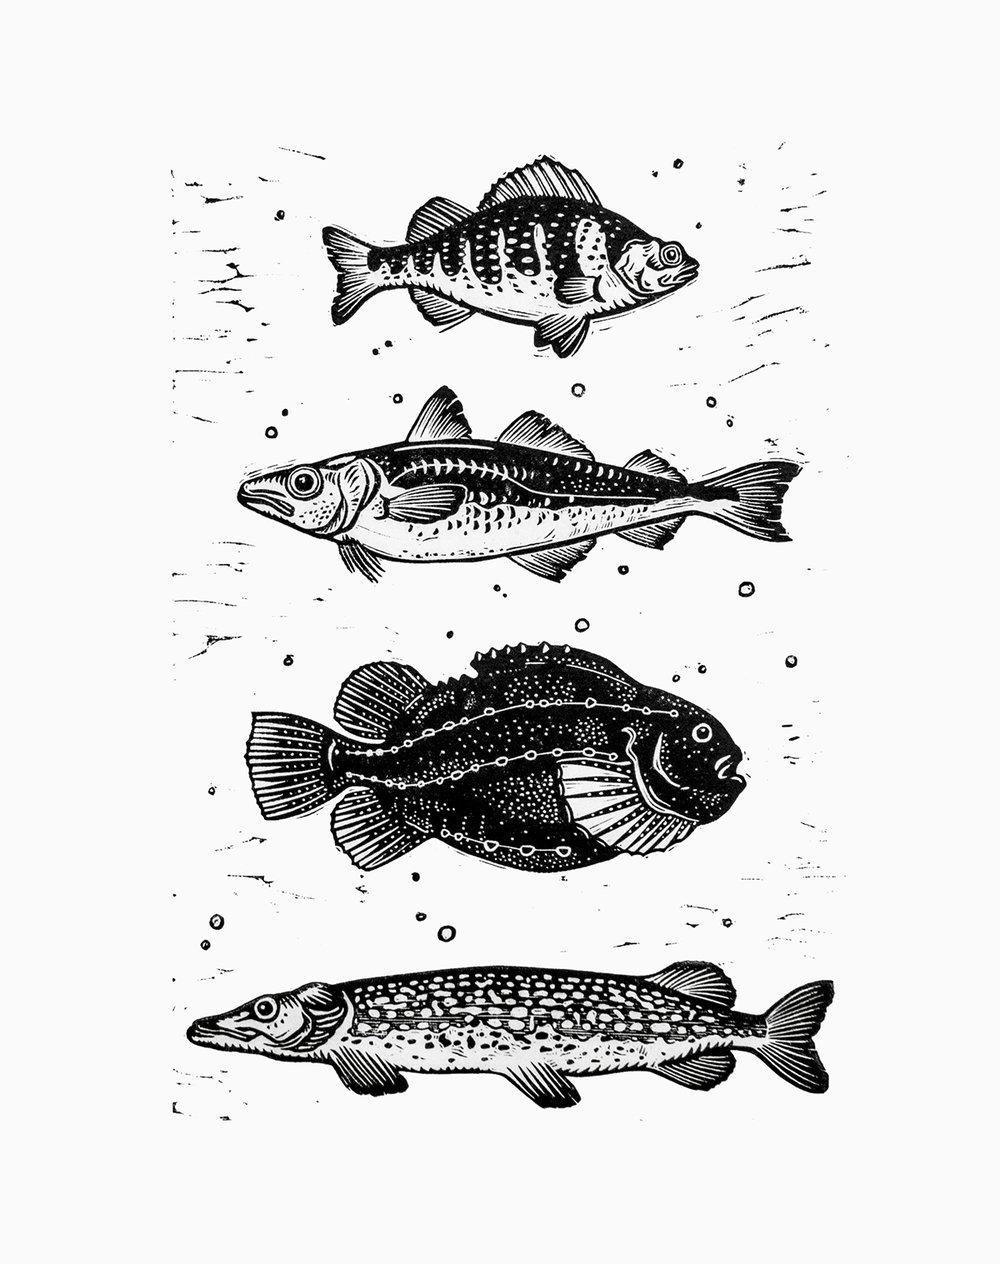 Original linocut with four typical Swedish fishes: abborre (European pirch), alaska pollock/torskfisk (a kind of cod), sjurygg (lumpfish or lumpsucker) and gädda (pike).  20 x 30 cm linocut. Edition of 10. Year 2015.